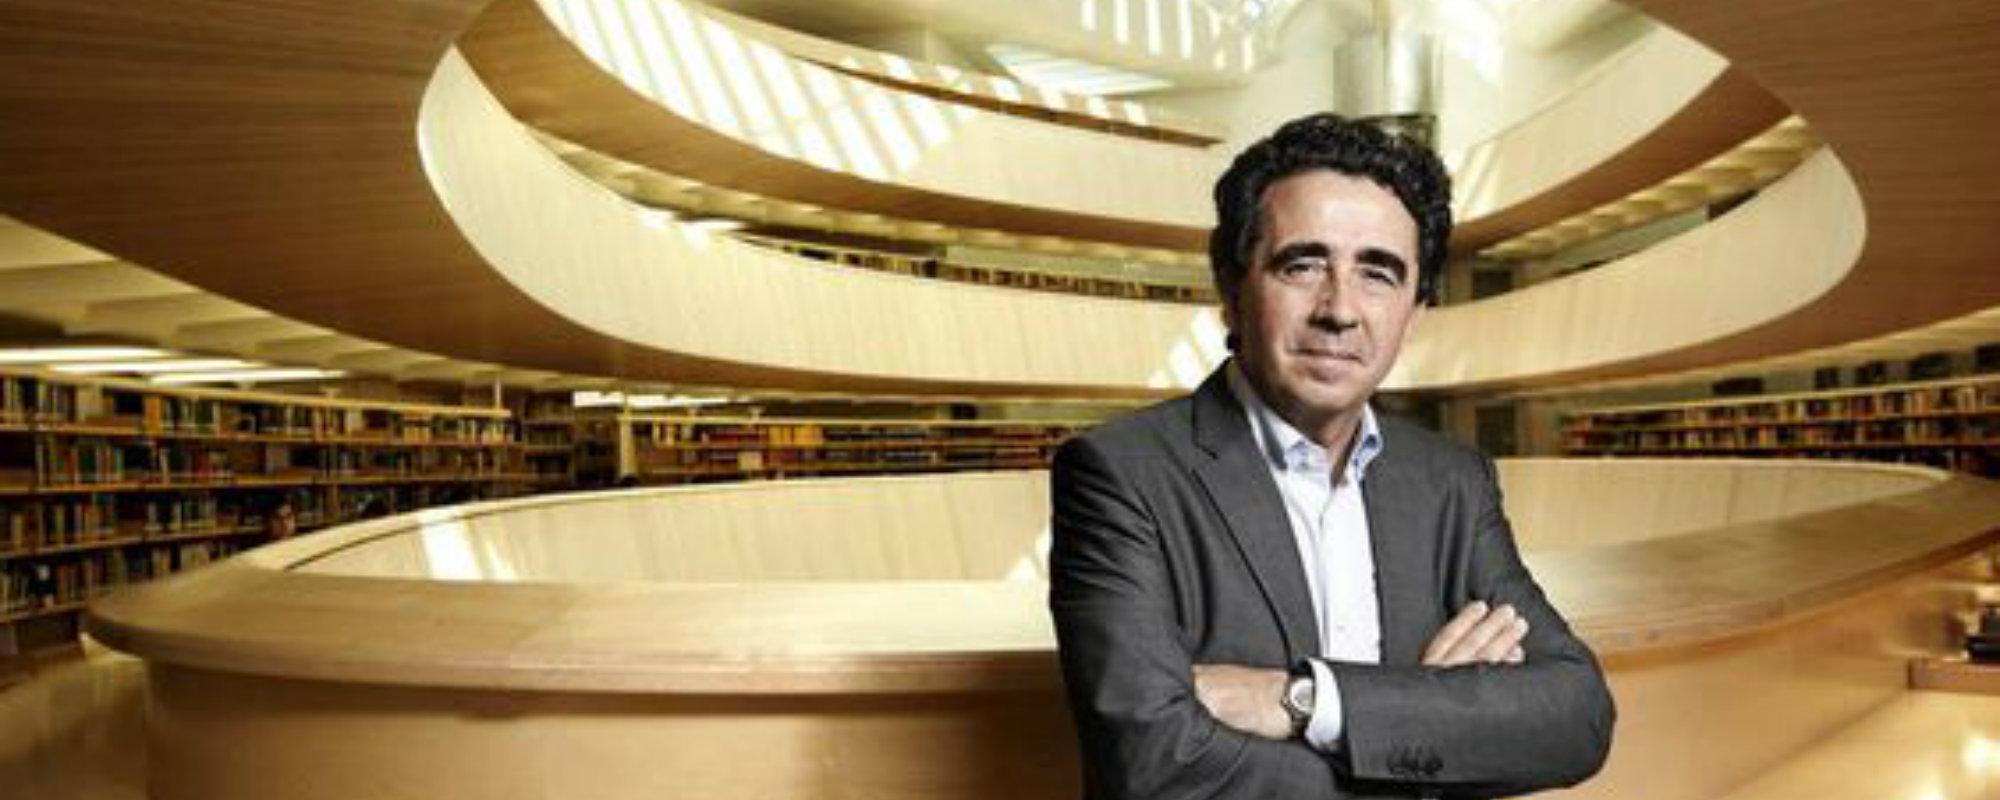 Santiago Calatrava: Un arquitecto fenomenal Santiago Calatrava Santiago Calatrava: Un arquitecto fenomenal Feature 12